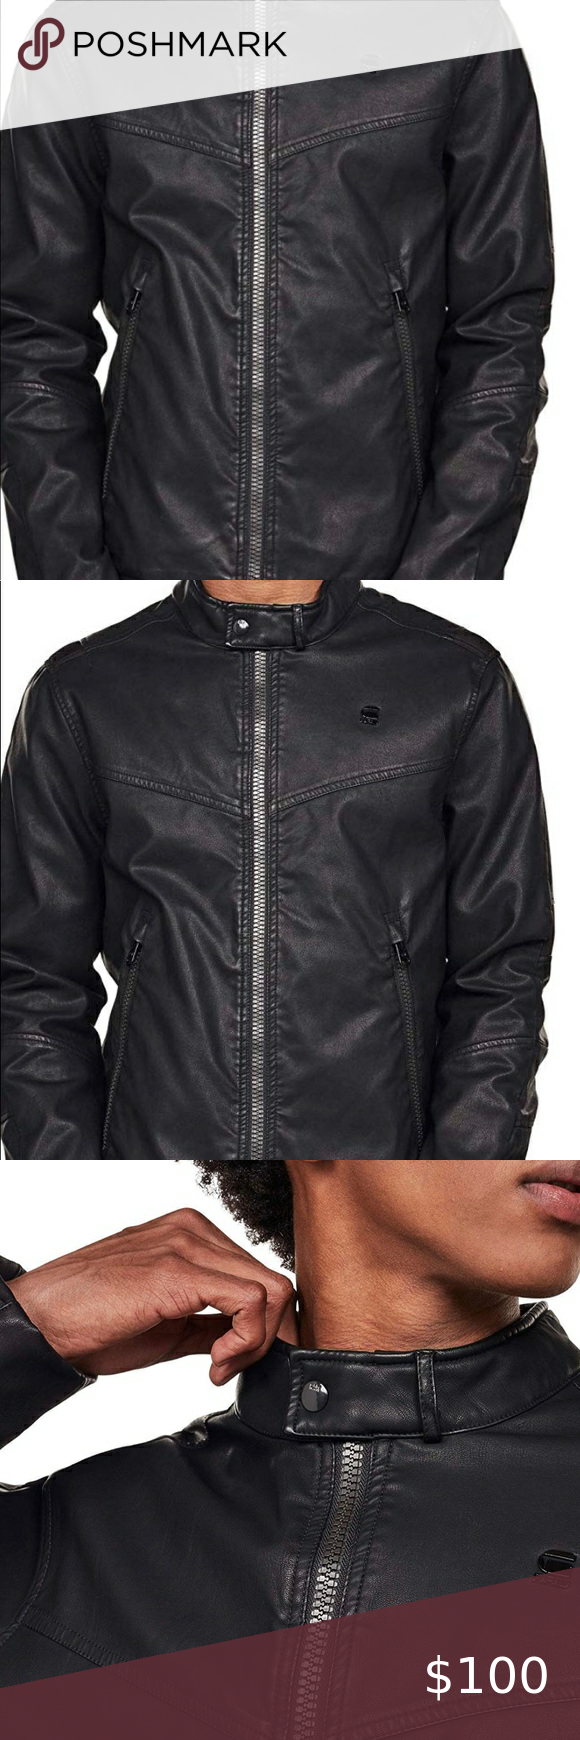 Gstar Moran Dc Biker Leather Jacket Xxl Leather Jacket G Star Jacket Denim Design [ 1740 x 580 Pixel ]